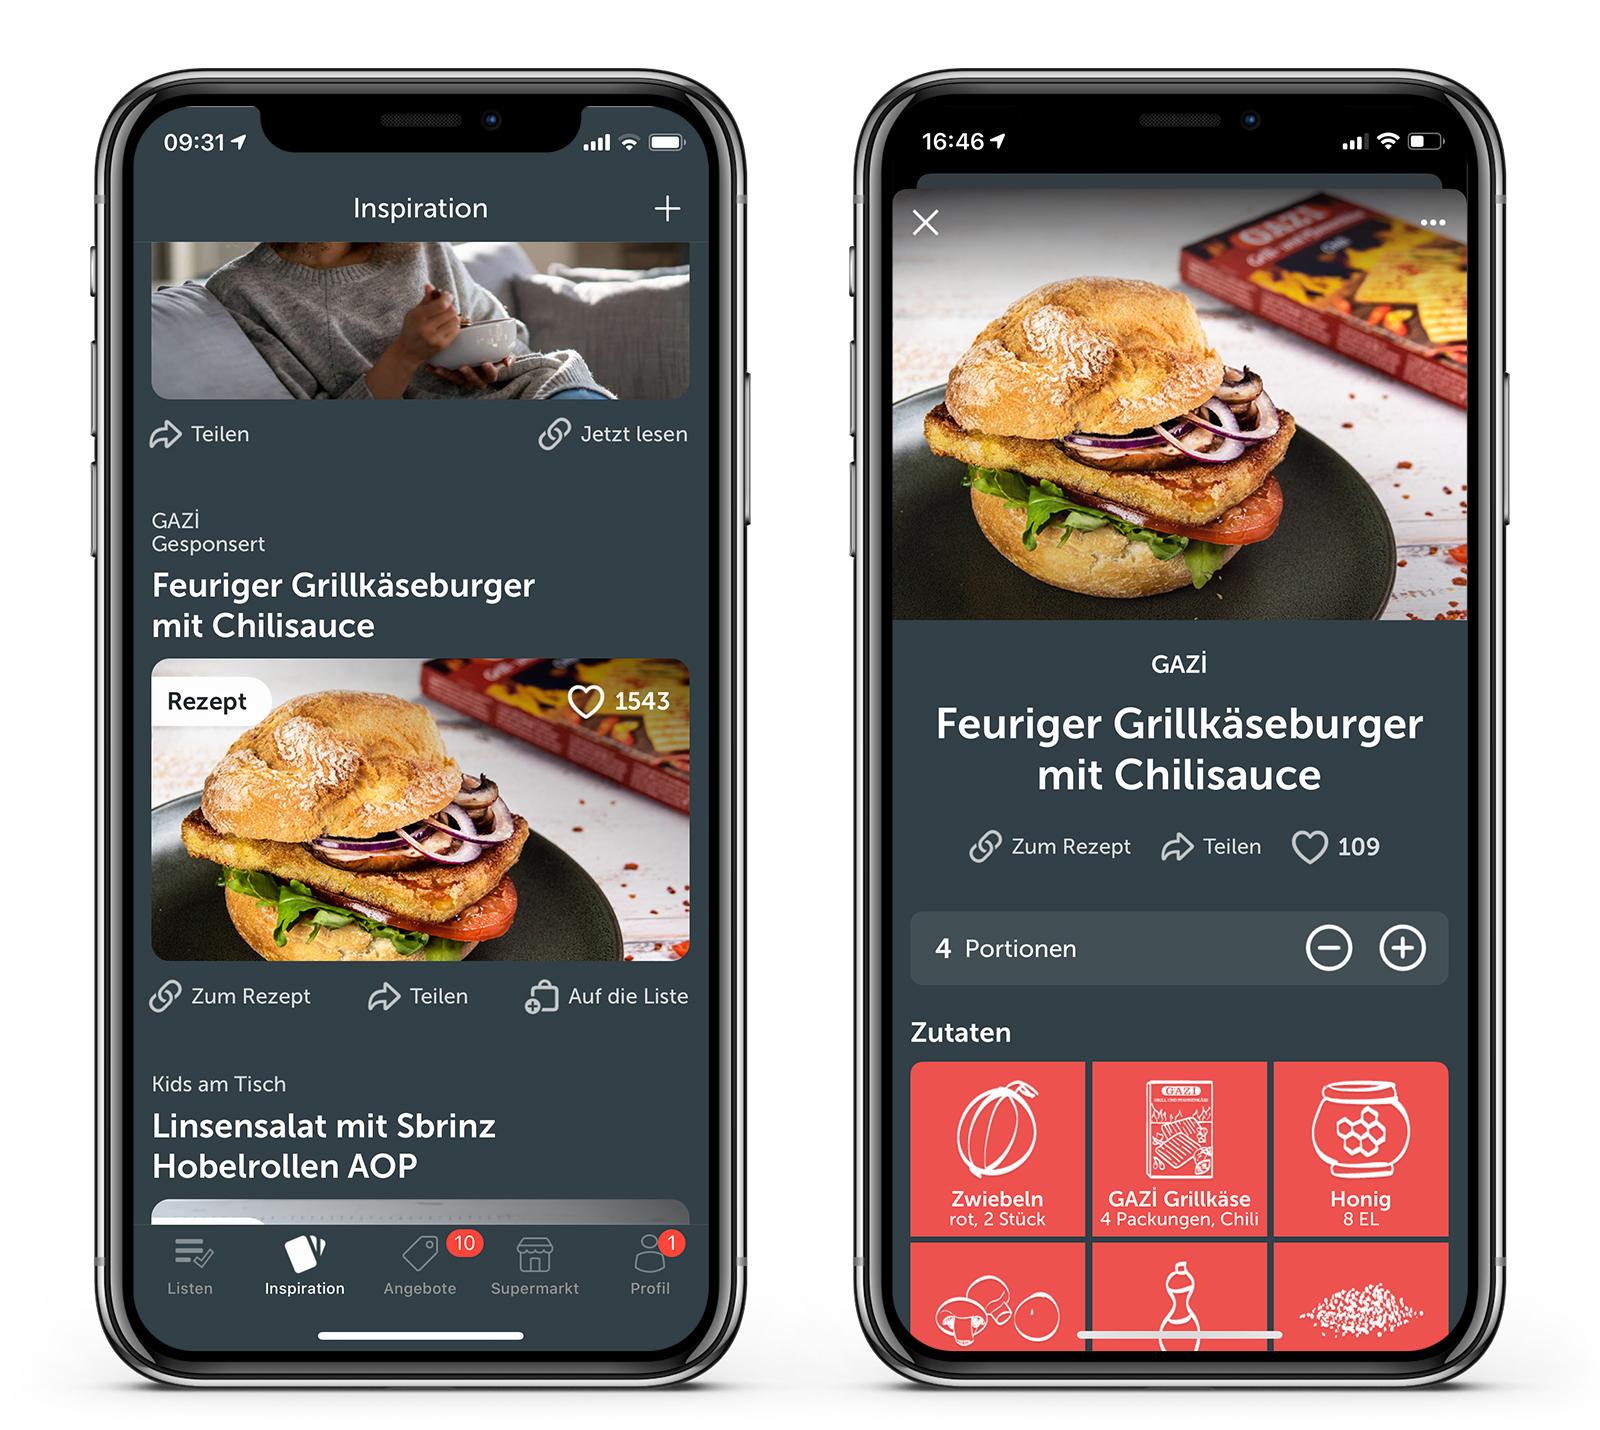 advertising-bring-app-sponsored-recipe-gazi